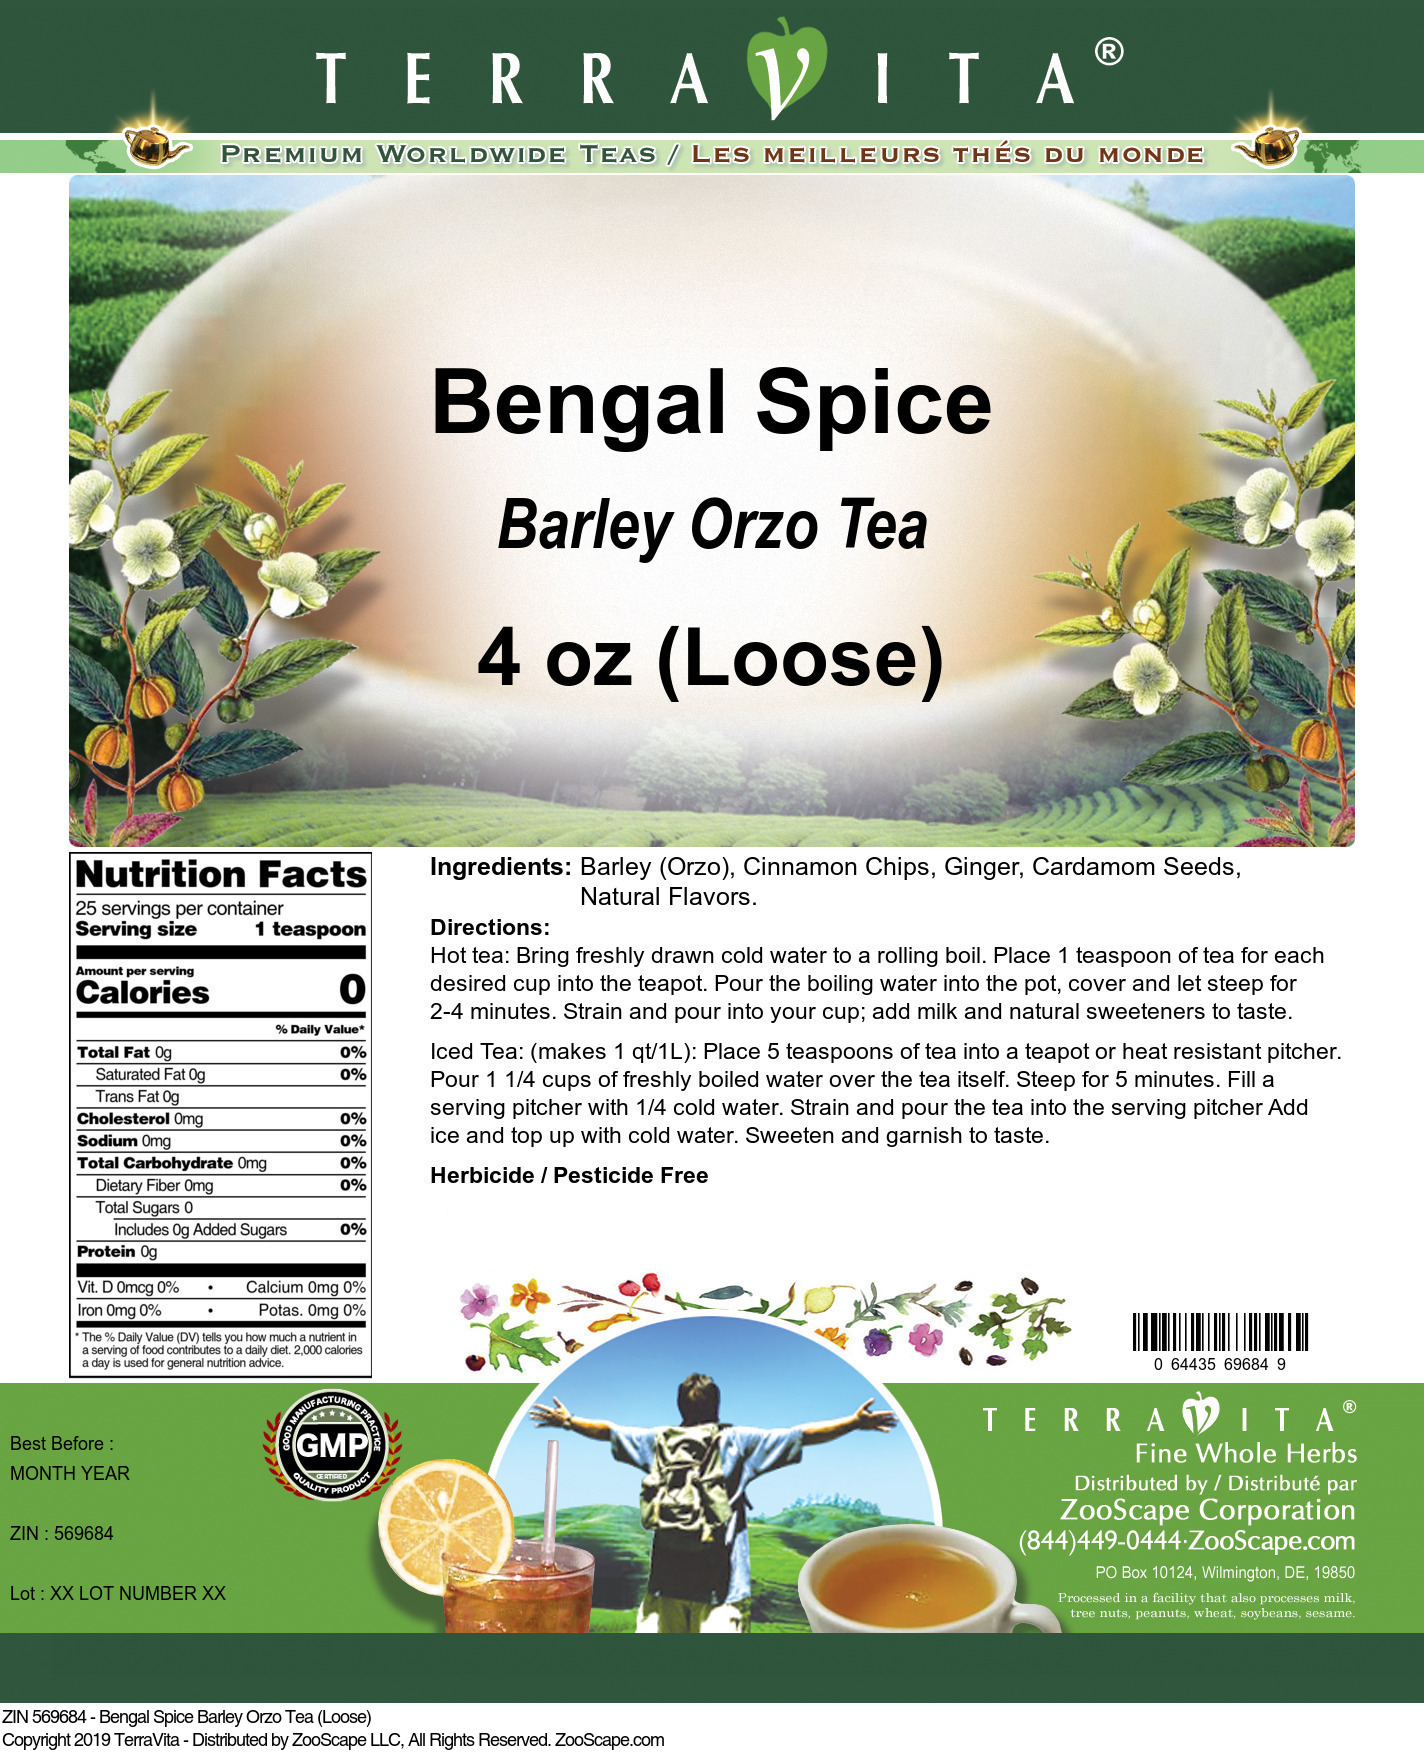 Bengal Spice Barley Orzo